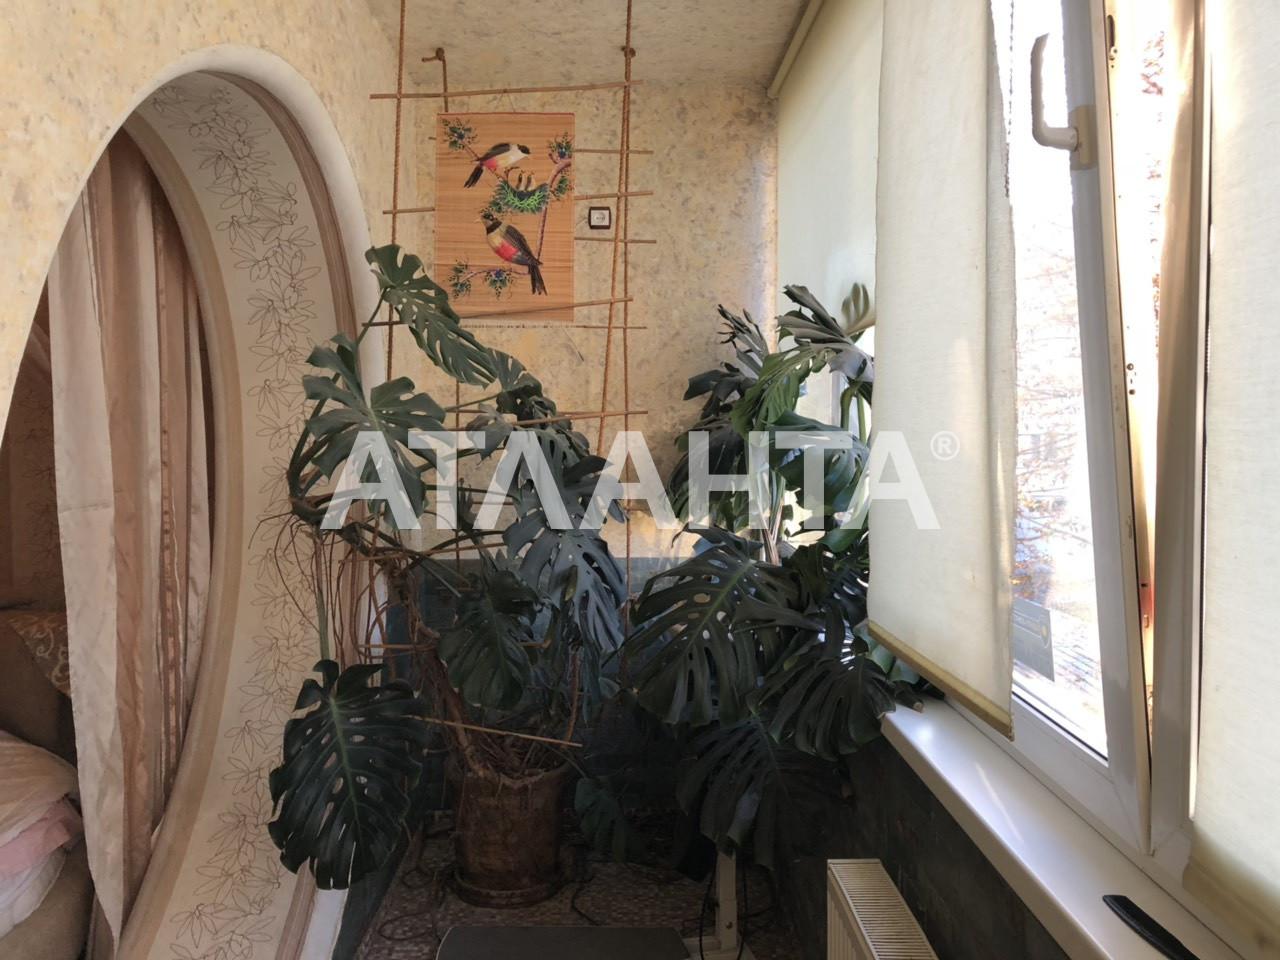 Продается 3-комнатная Квартира на ул. 1 Мая — 135 000 у.е. (фото №9)